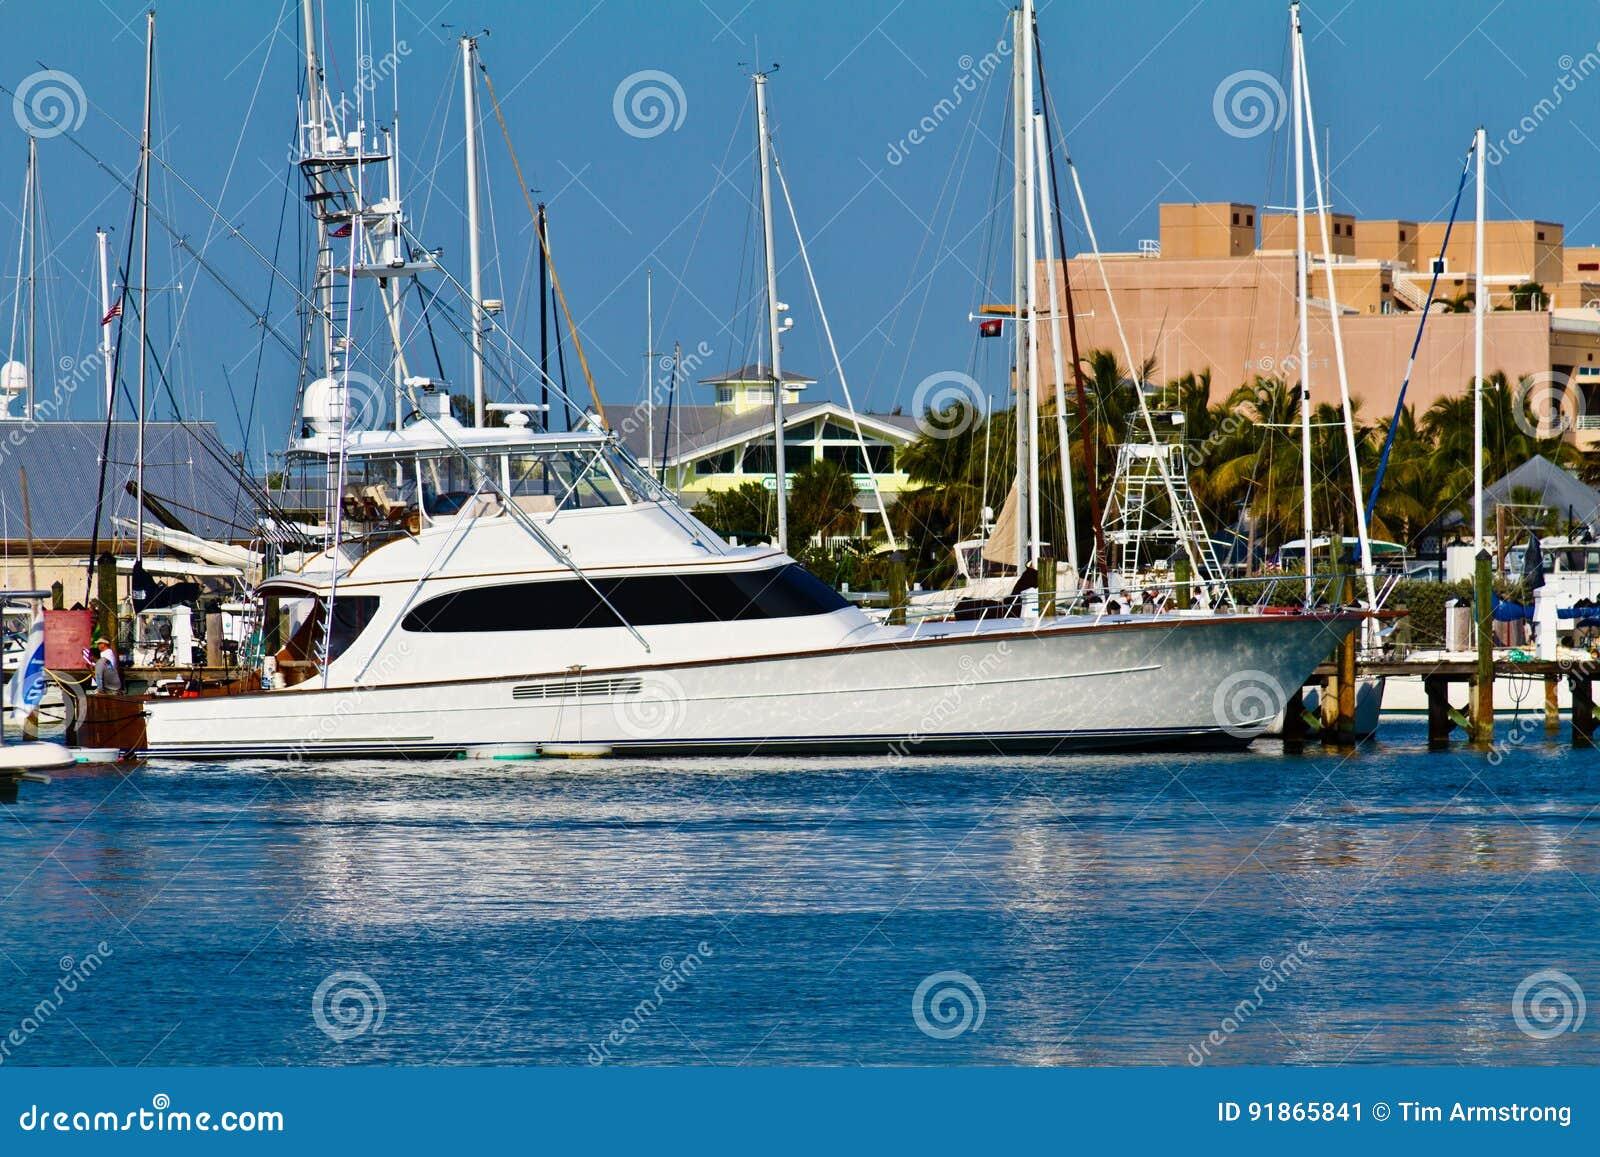 Key West Marina Yatch